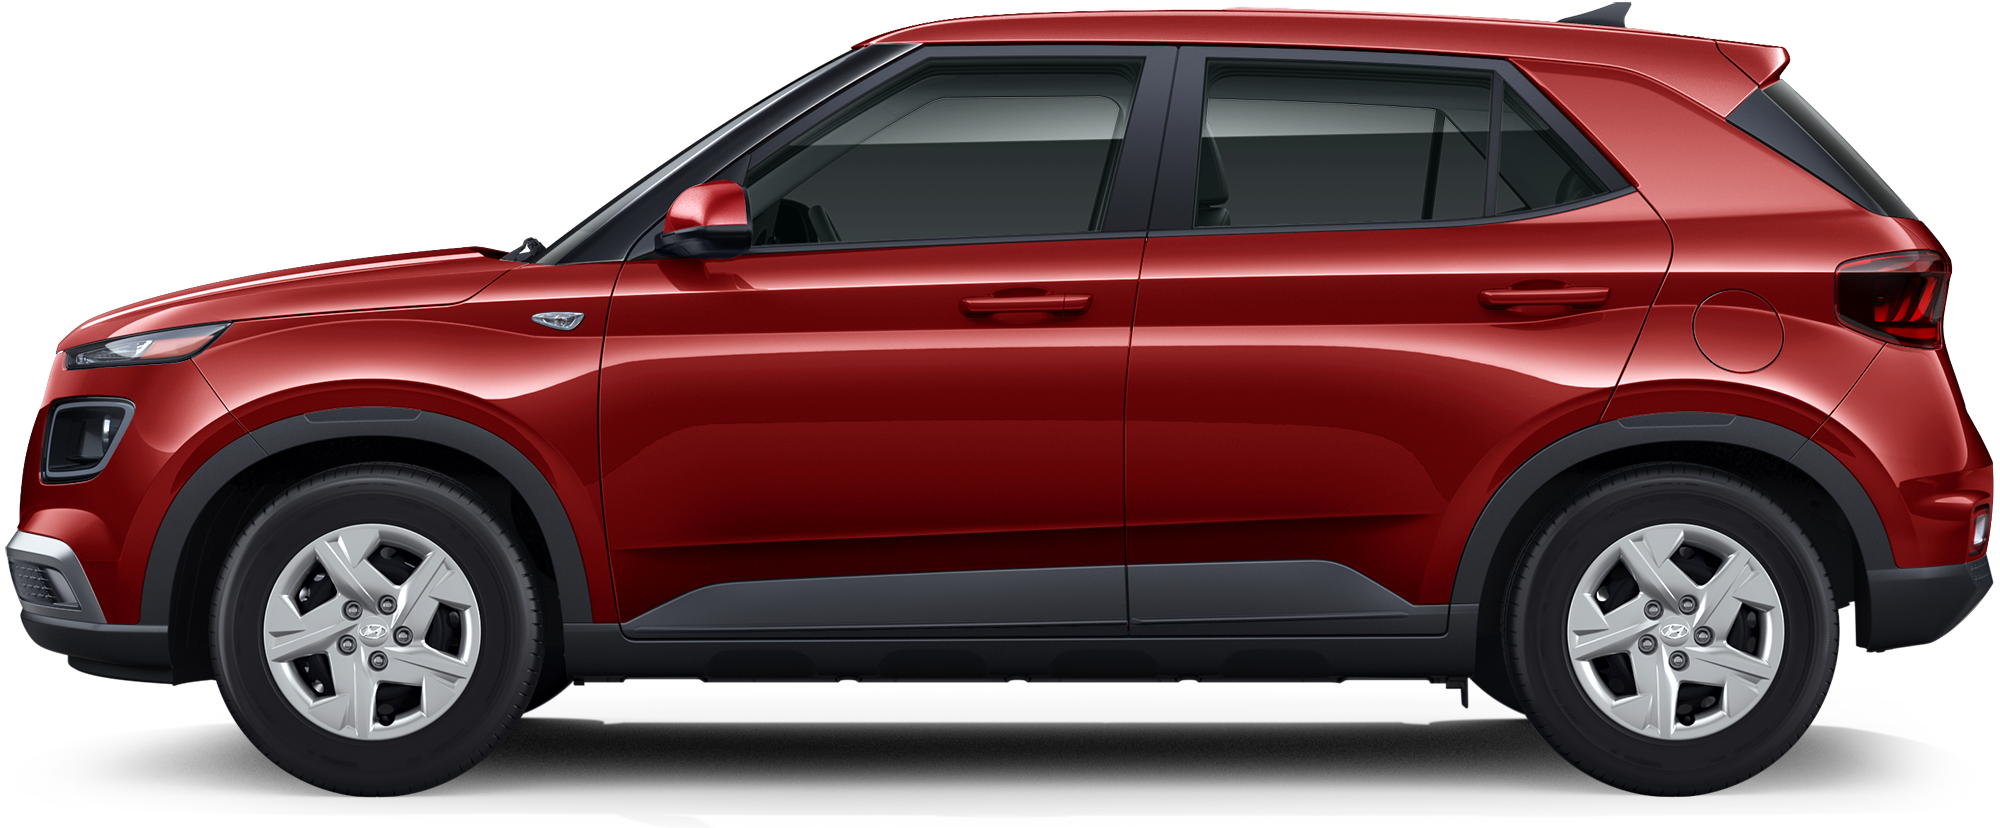 2020 Hyundai Venue SUV Essential